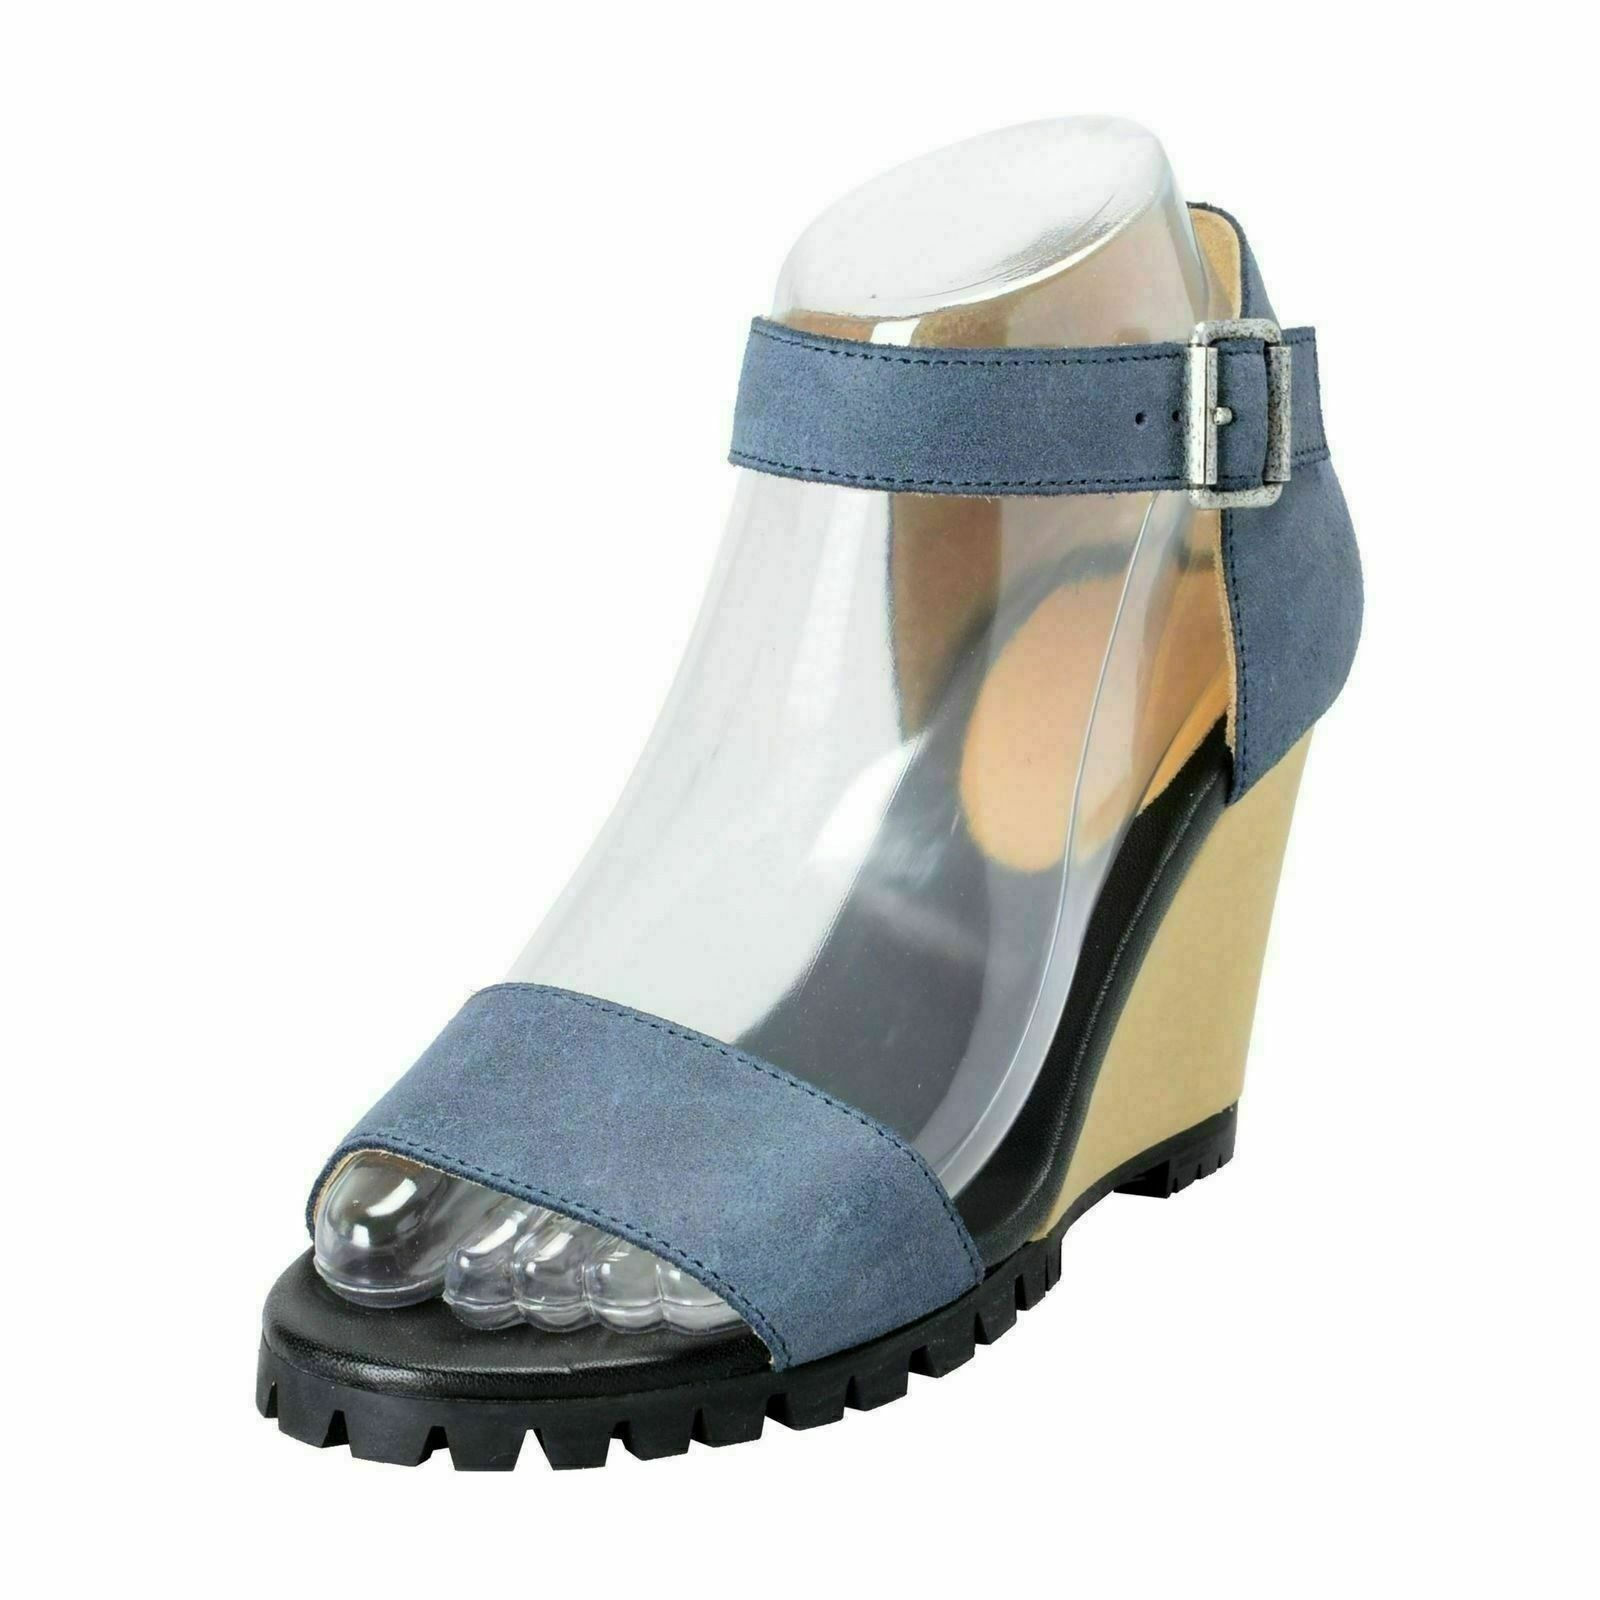 Maison Margiela Mm6 Damen Leder Knöchel Starp Keilabsätze Sandalen Schuhe US 6